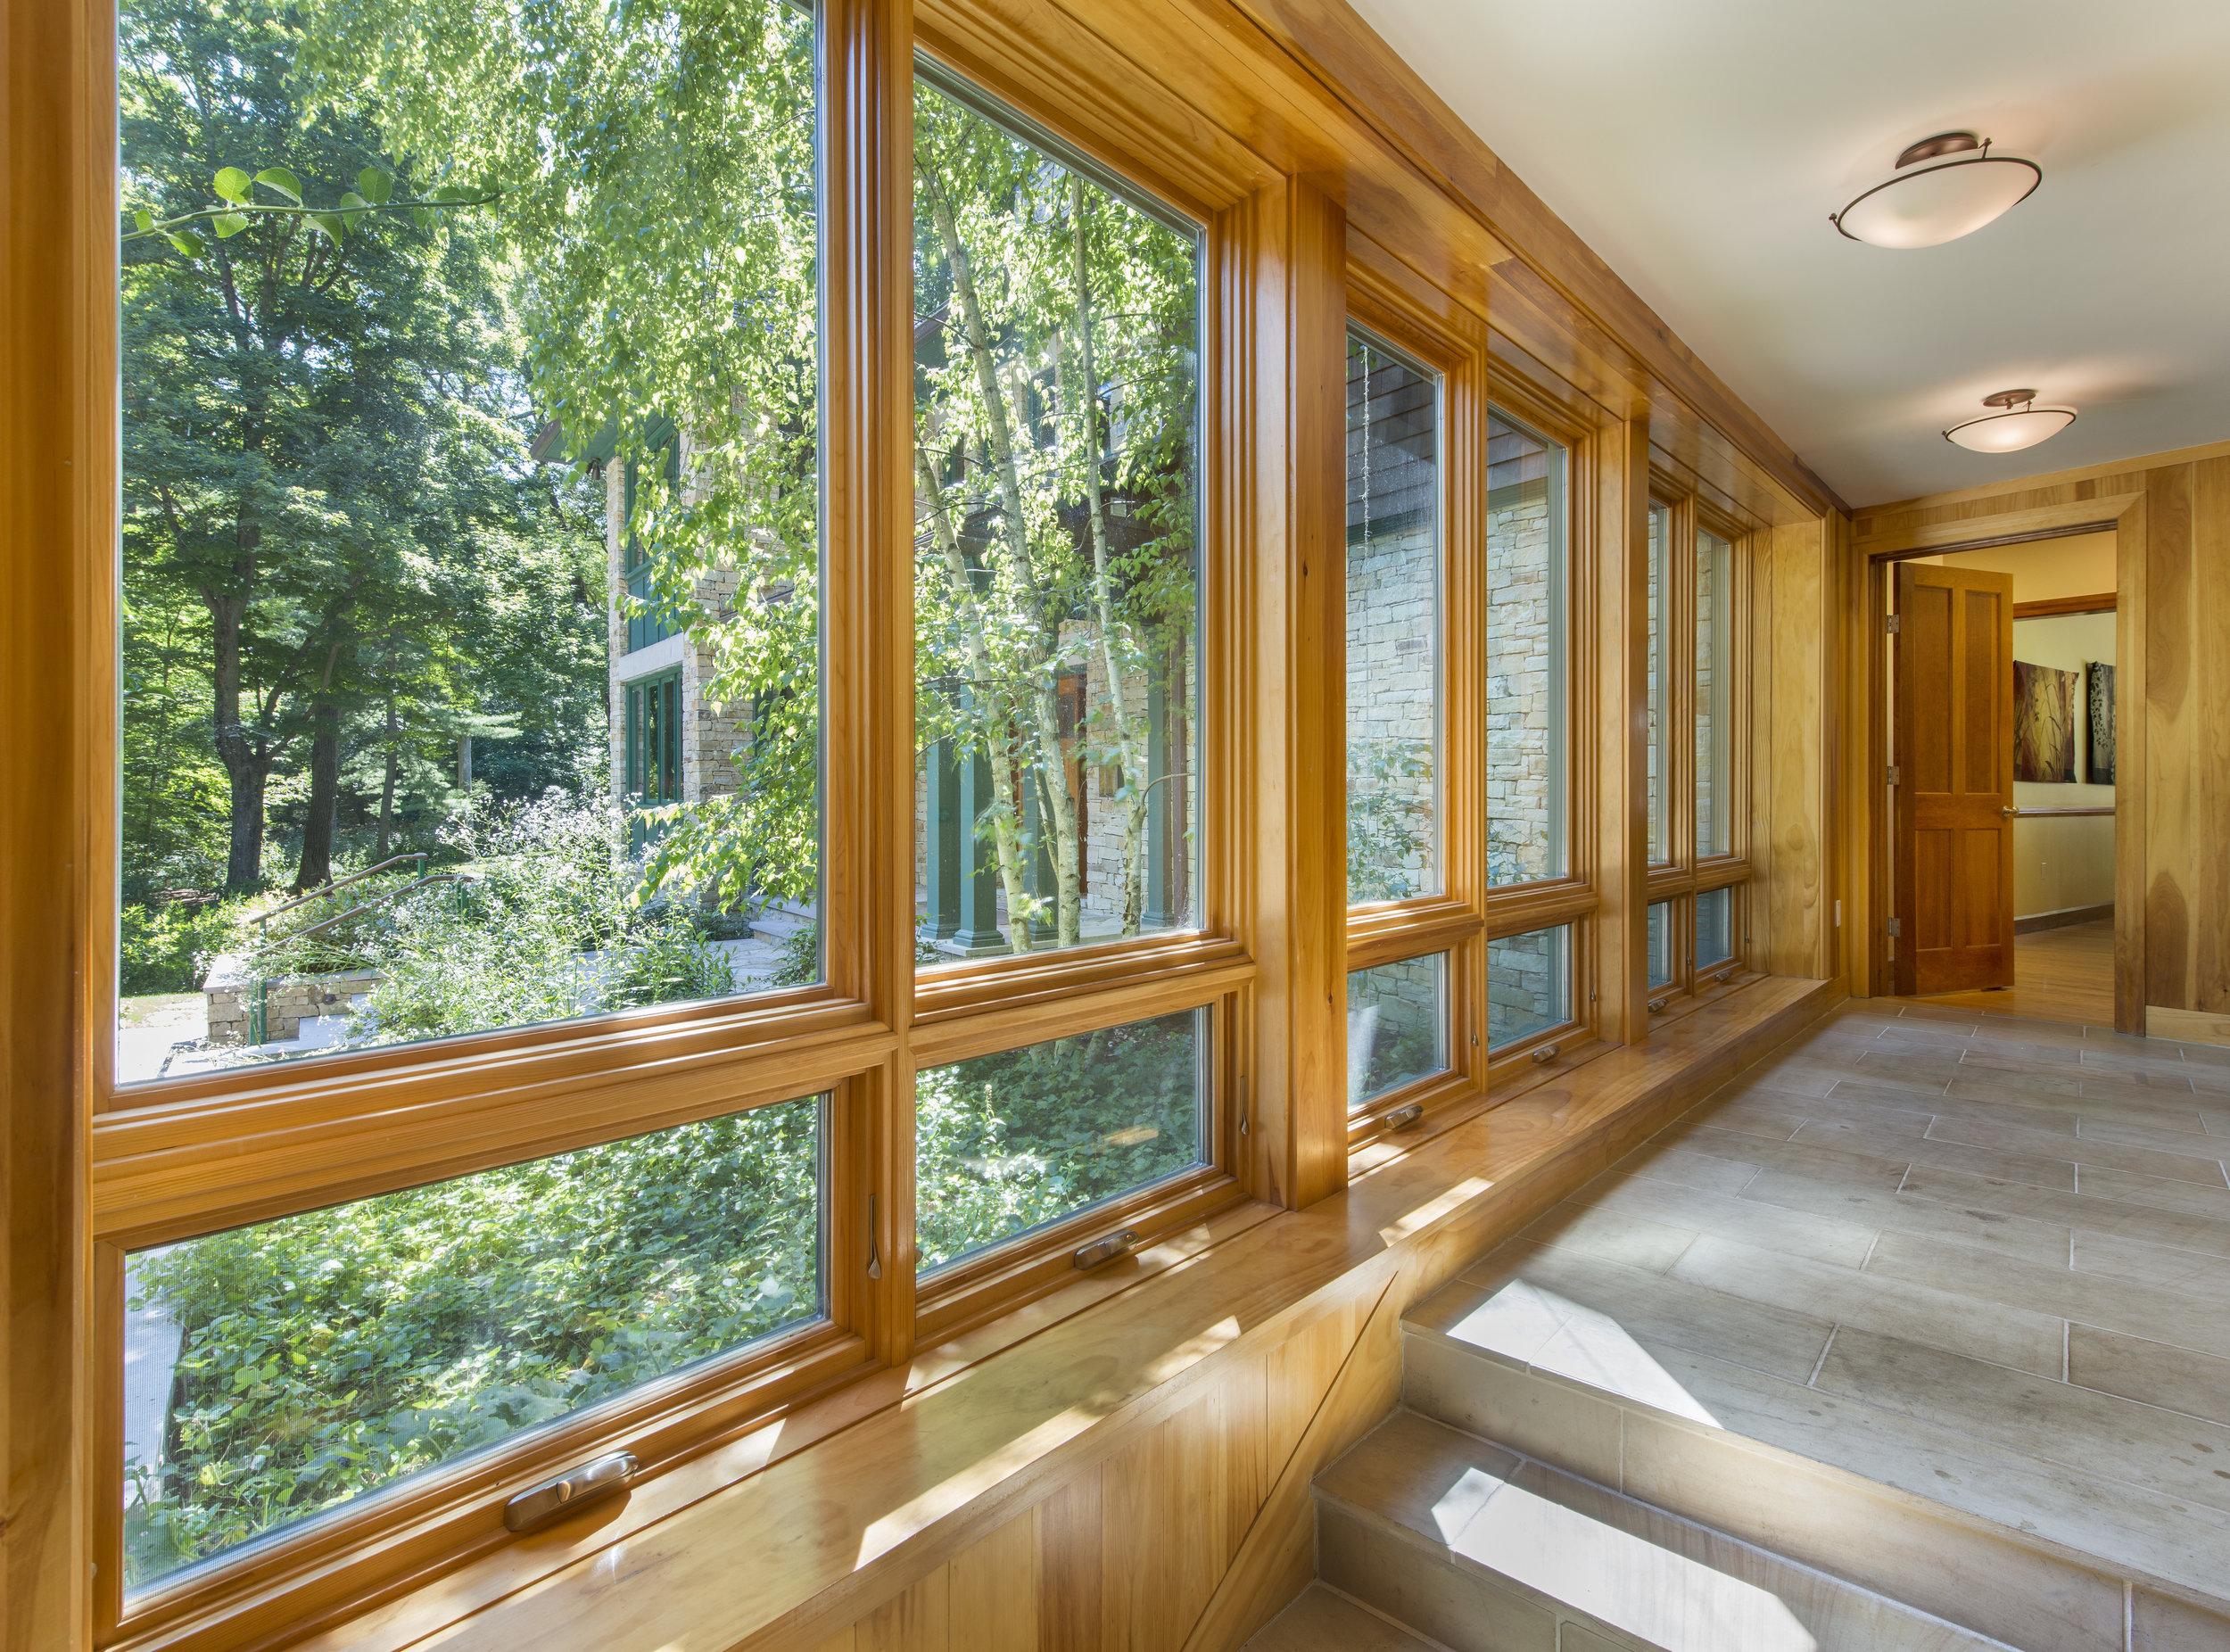 Sunny mudroom with wood windows